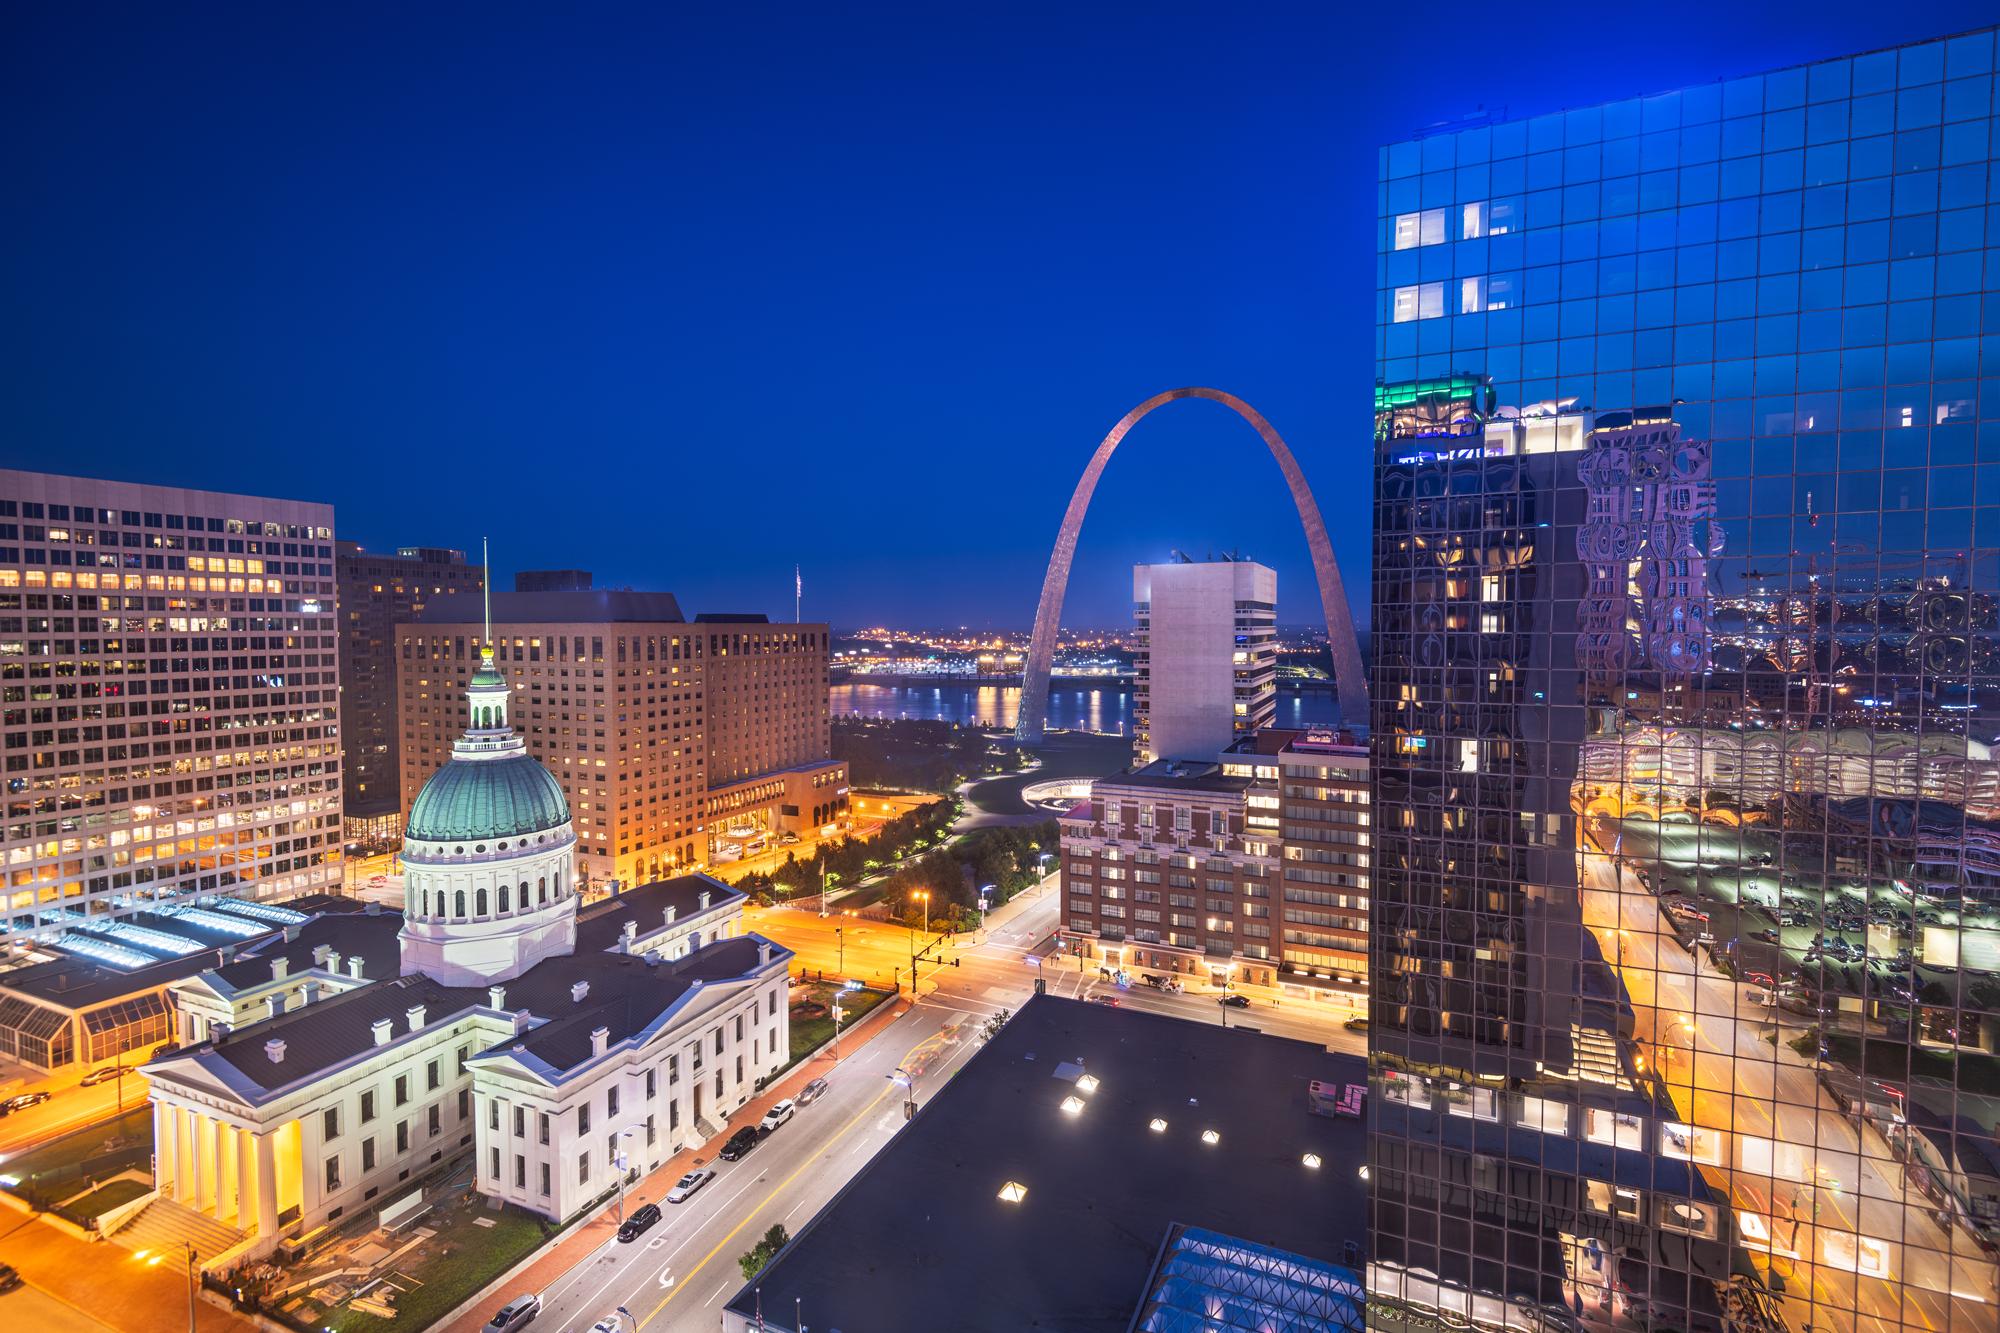 bigstock-St-Louis-Missouri-USA-downt-342803479